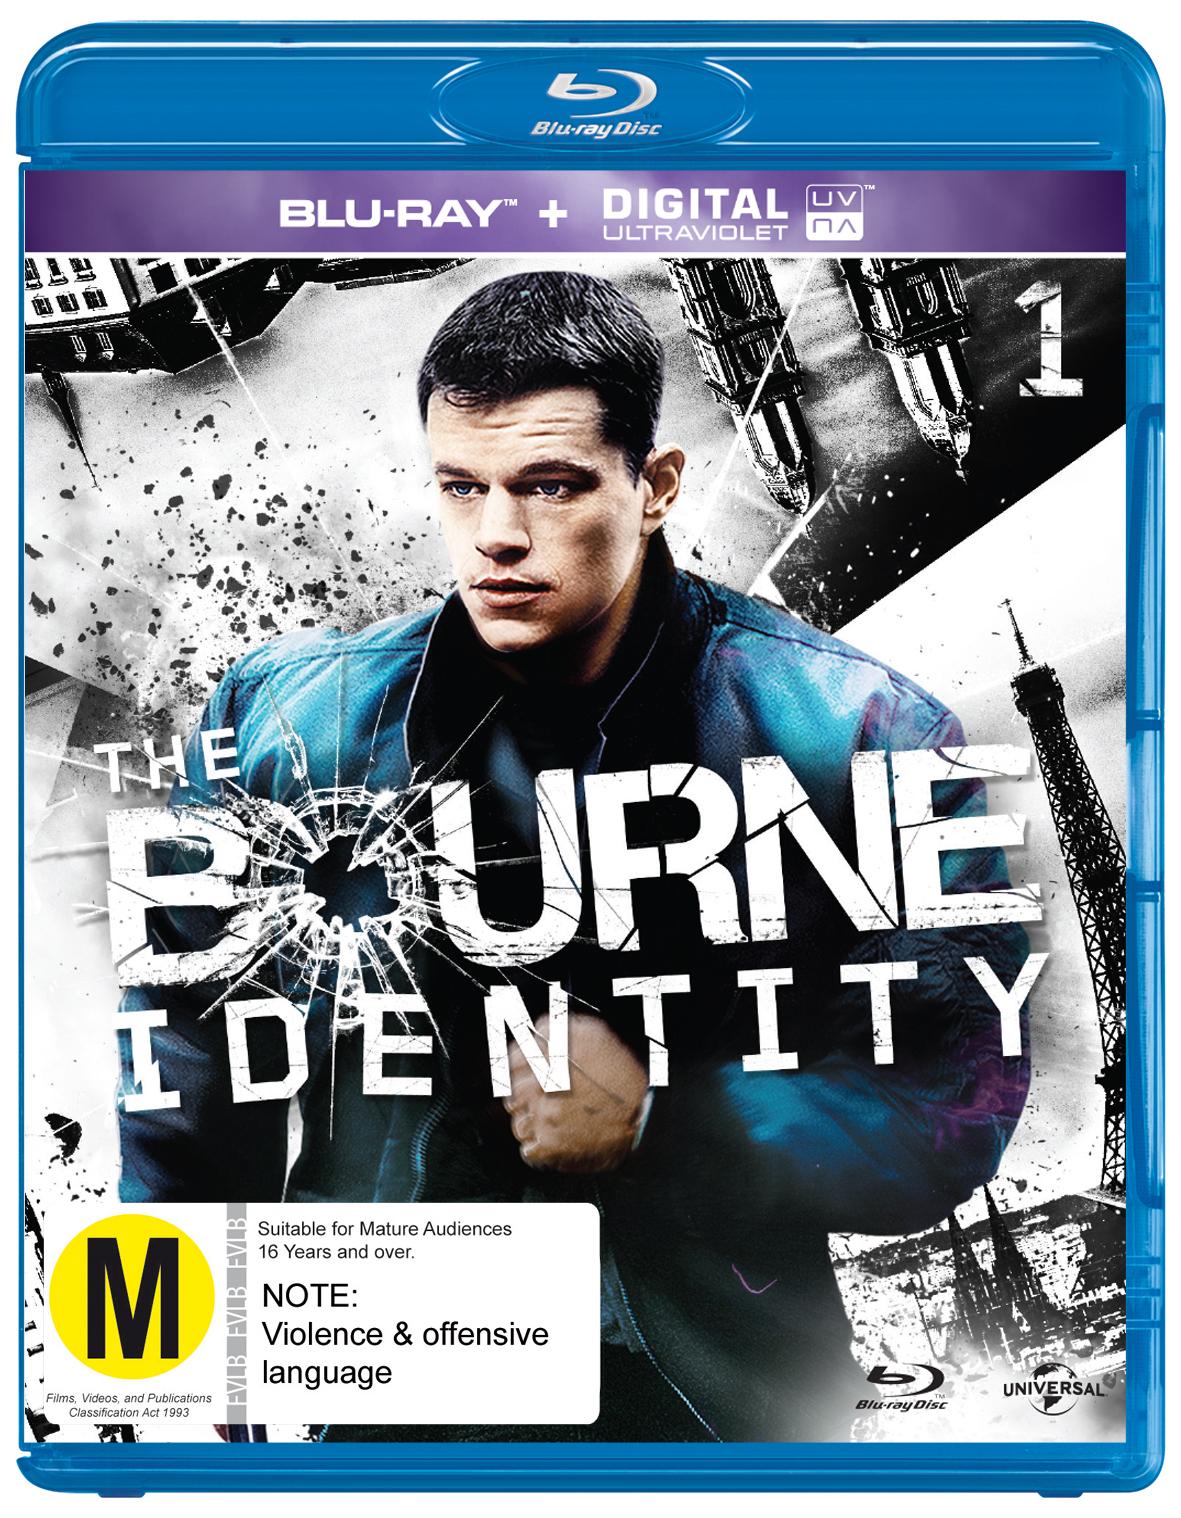 The Bourne Identity on Blu-ray, UV image